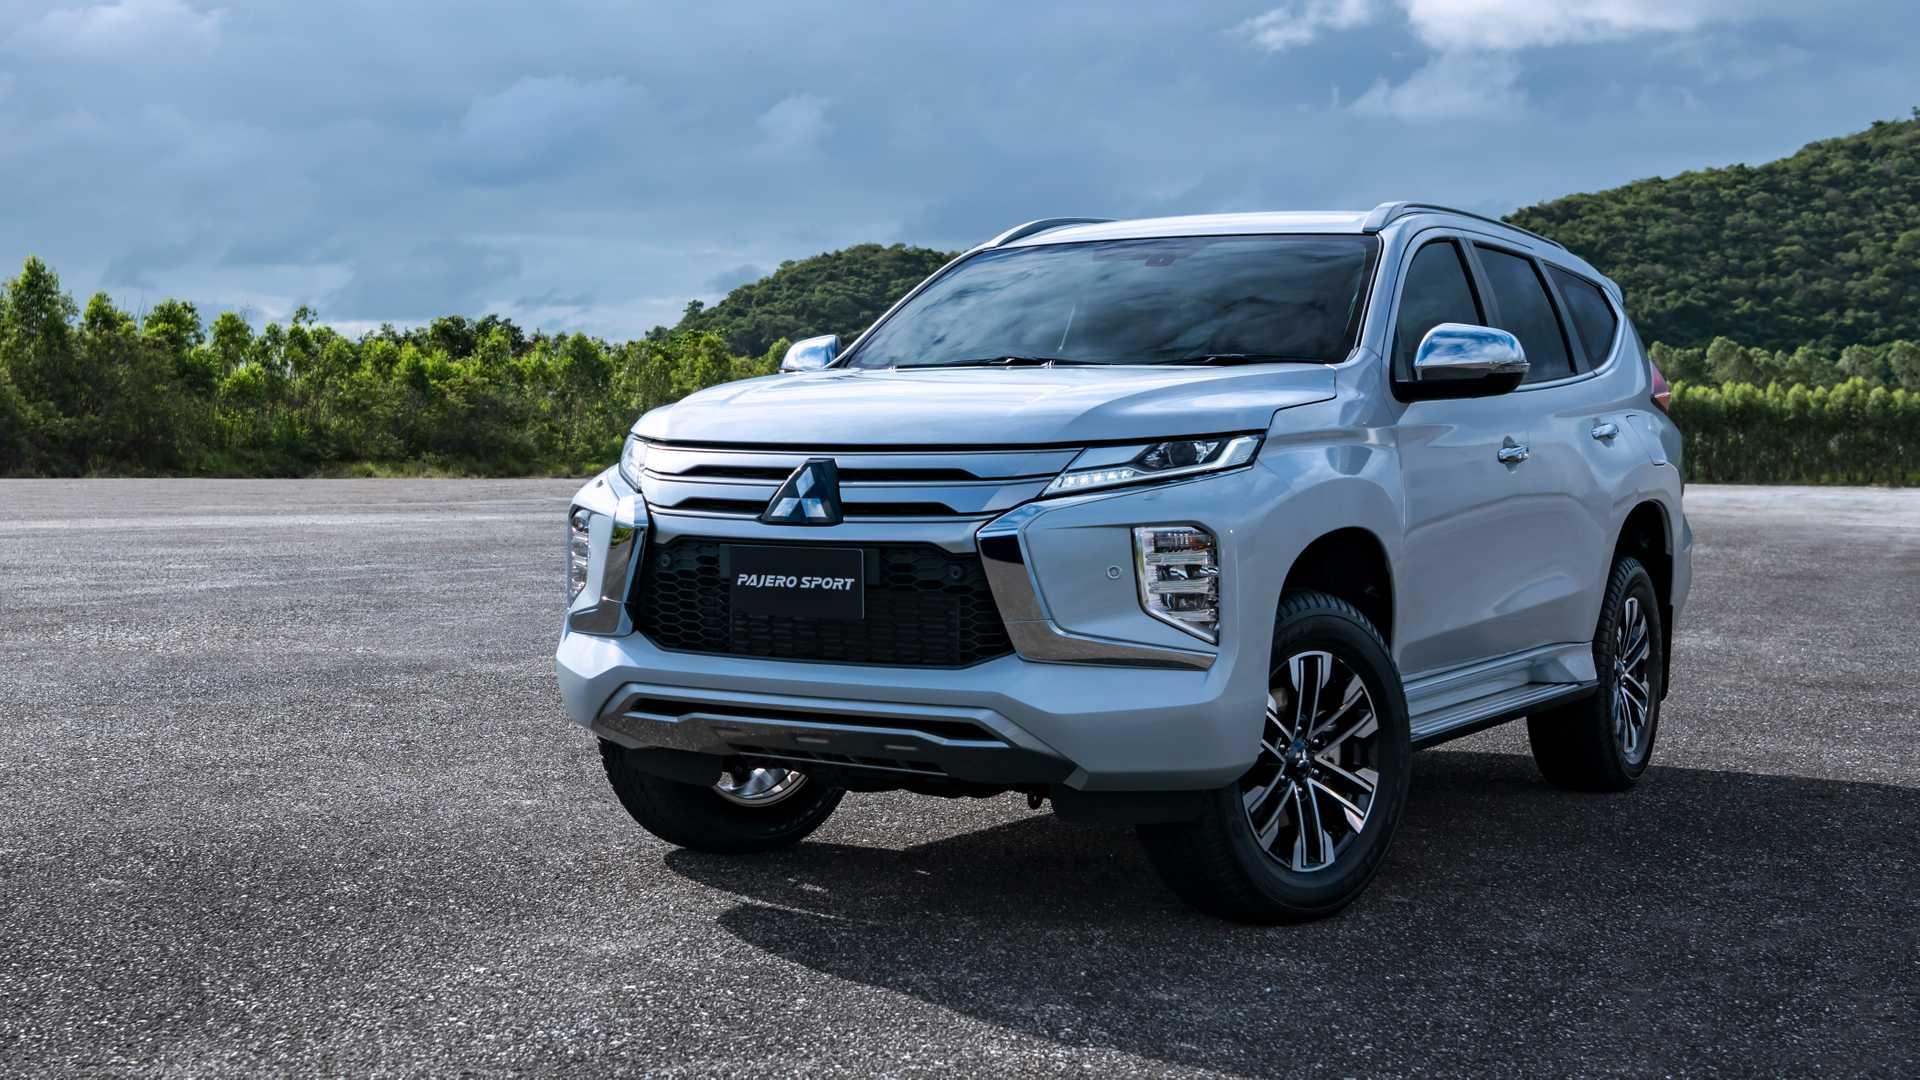 2020_Mitsubishi_Pajero_Sport_facelift_0004